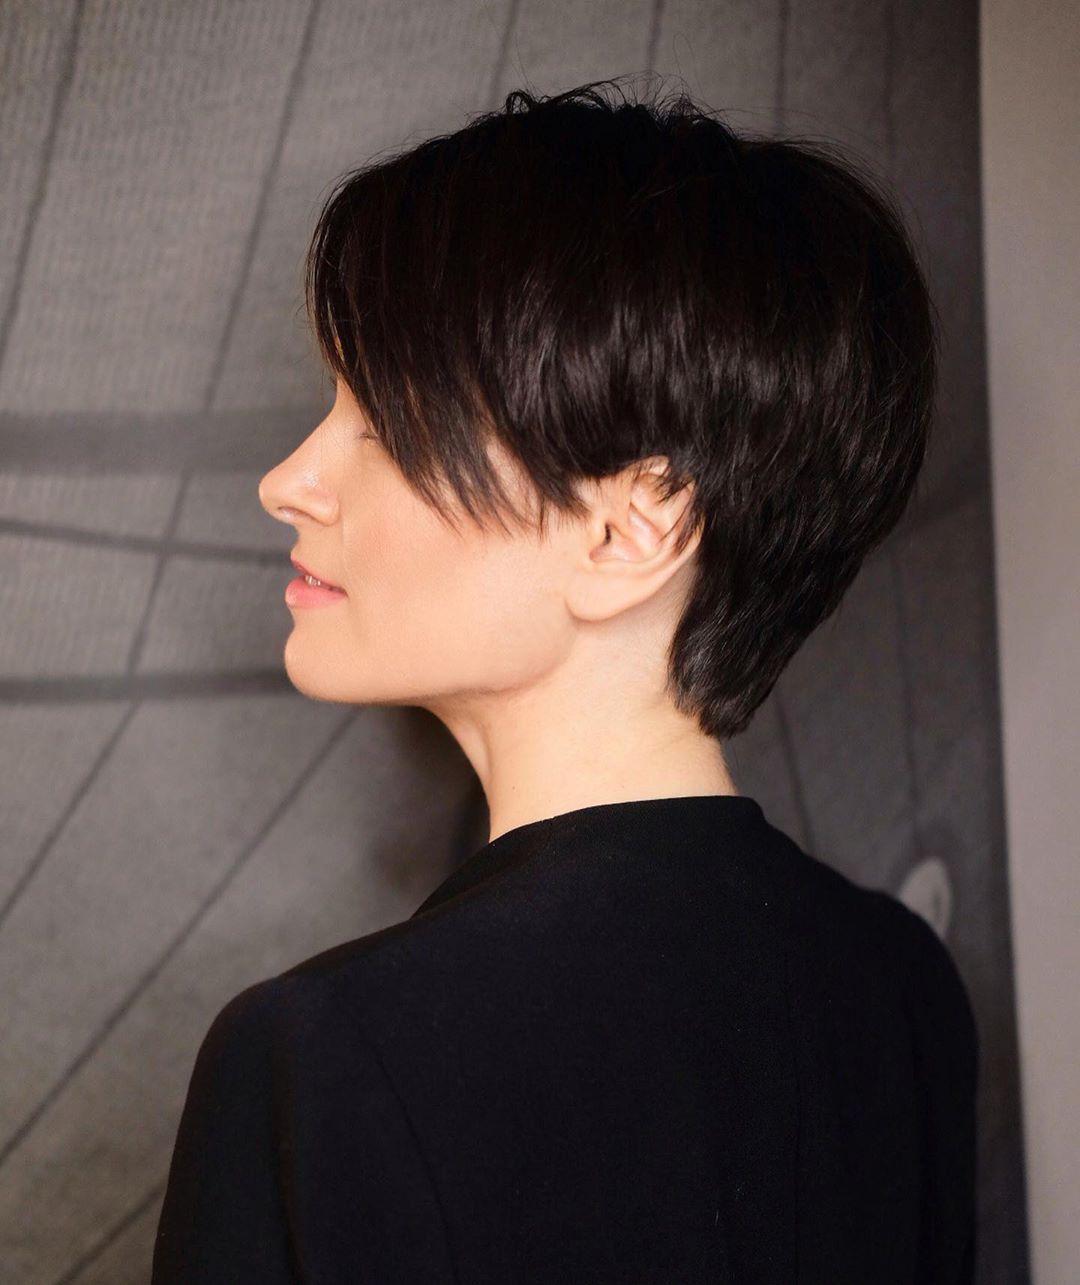 Stylish Easy Pixie Haircut for Women - Short Pixie Hair Style Ideas